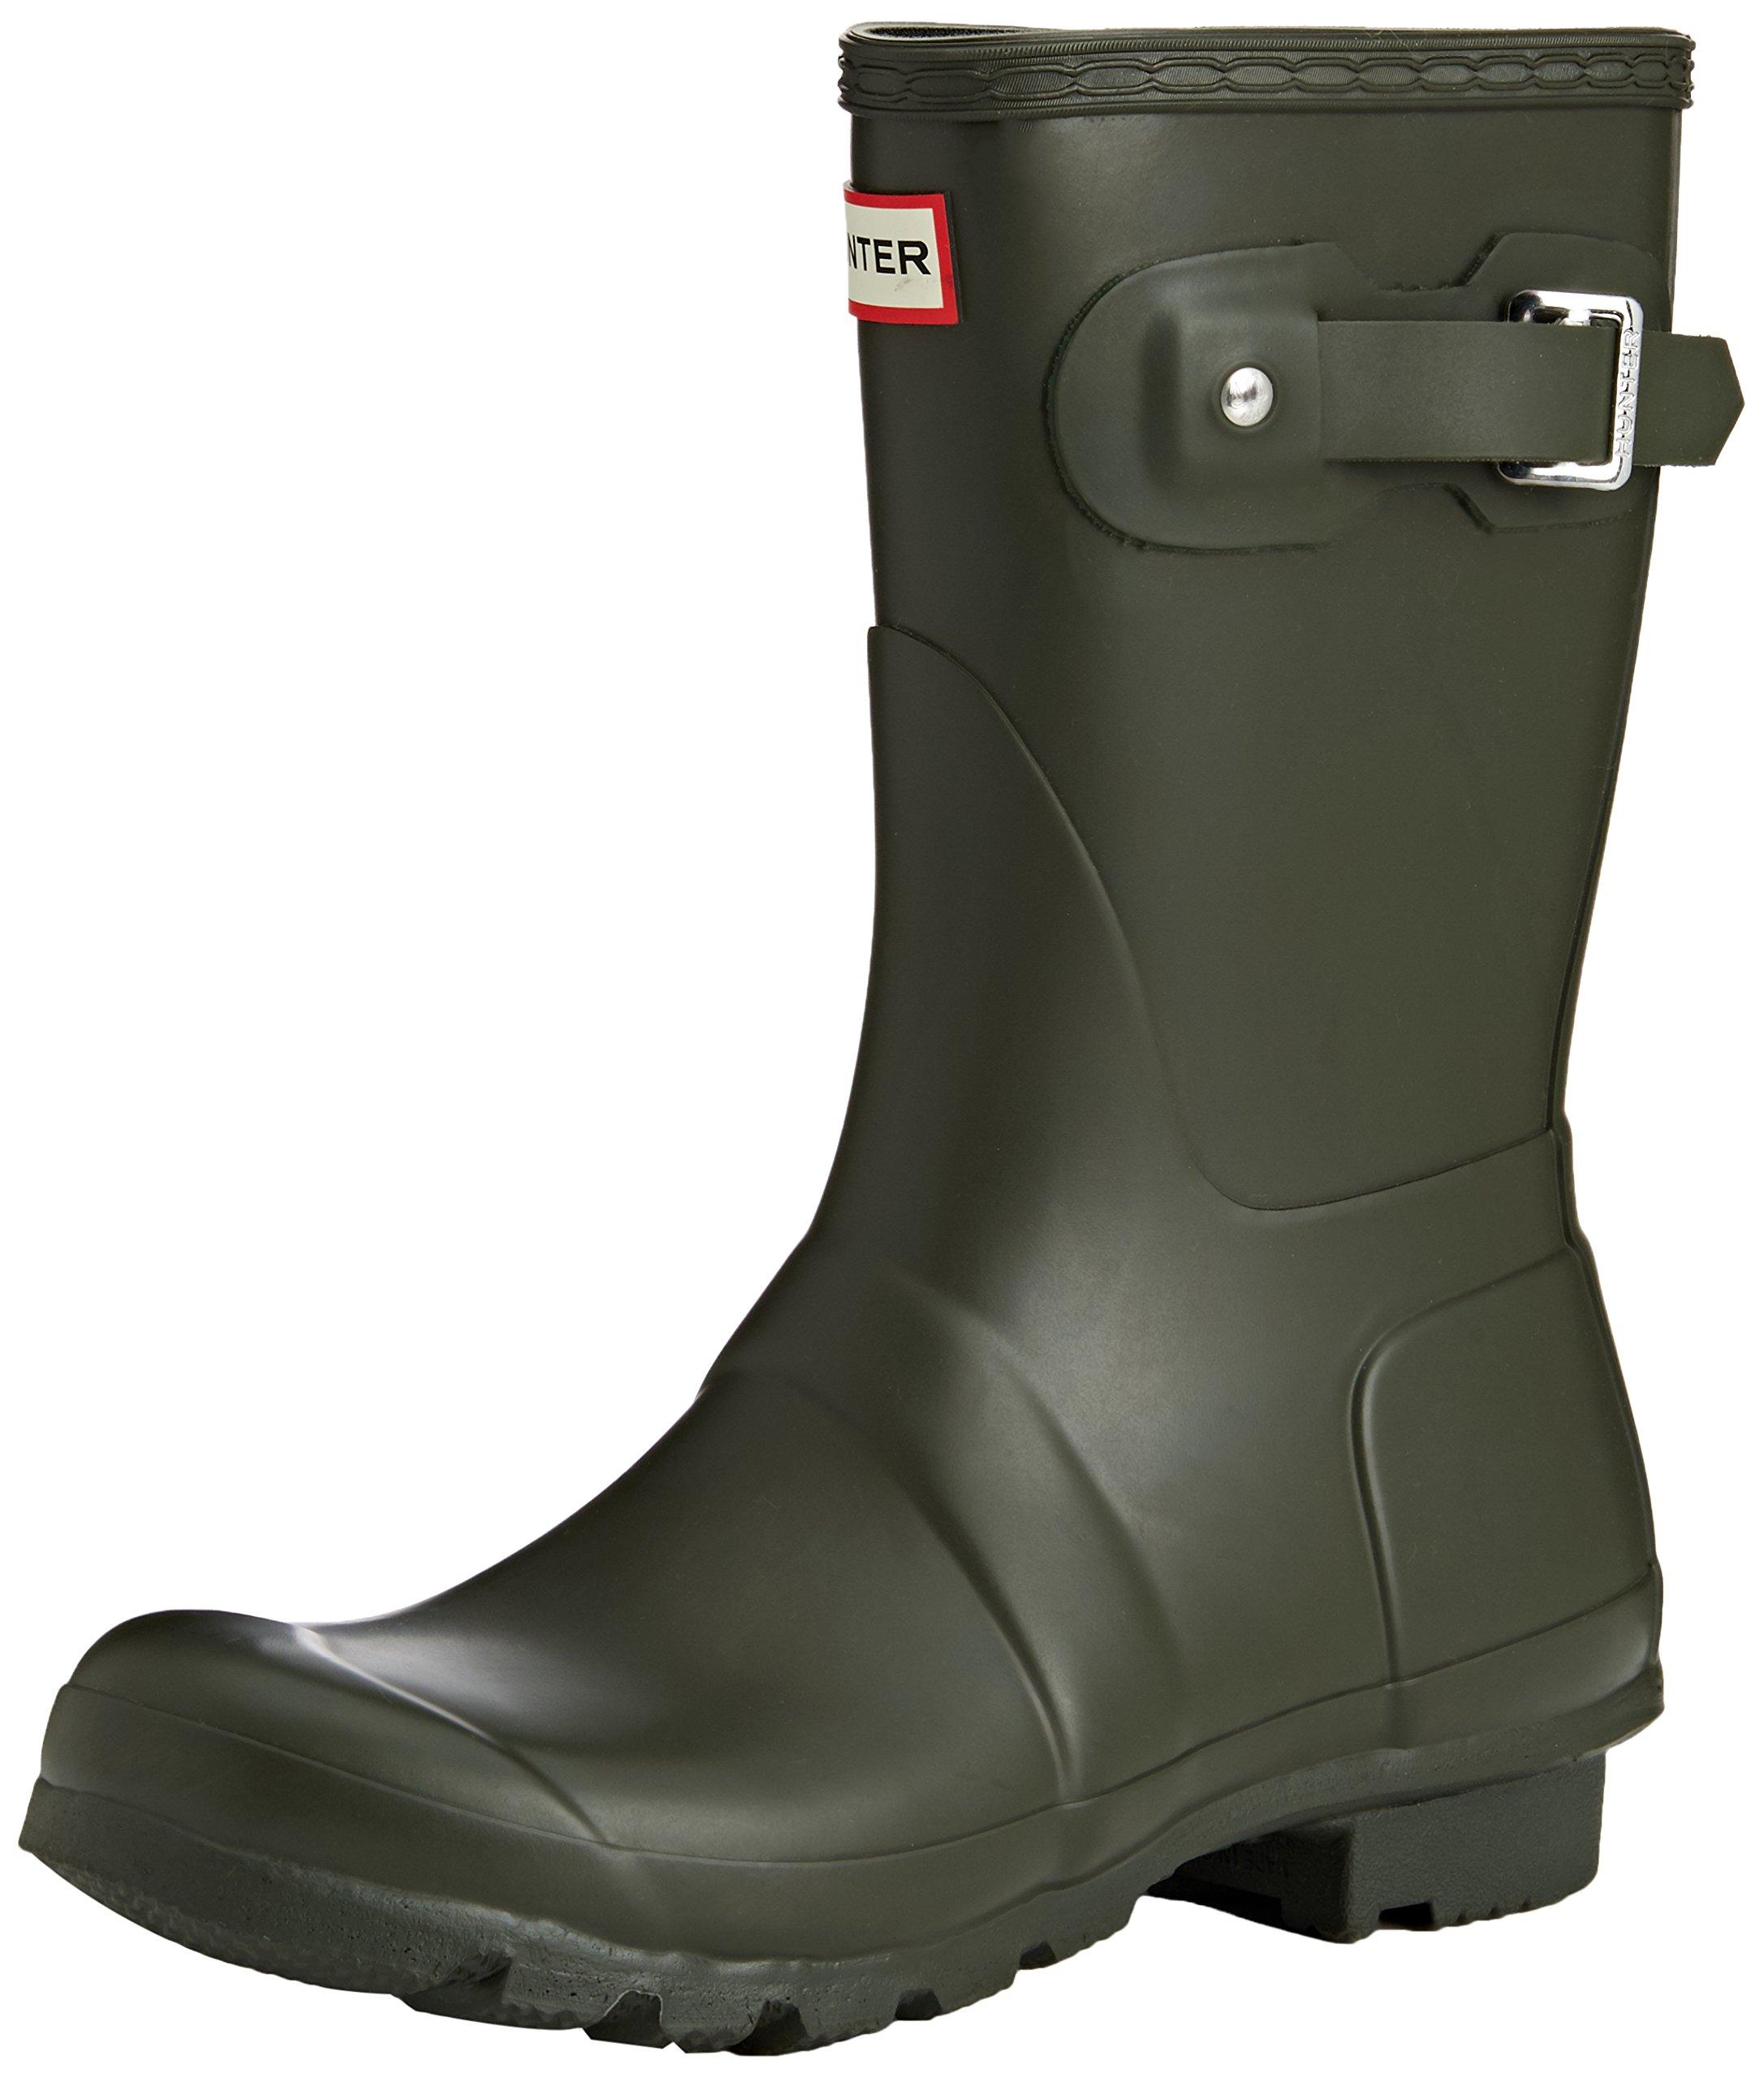 Hunter Women's Original Short Rain Boots Dark Olive 8 M US